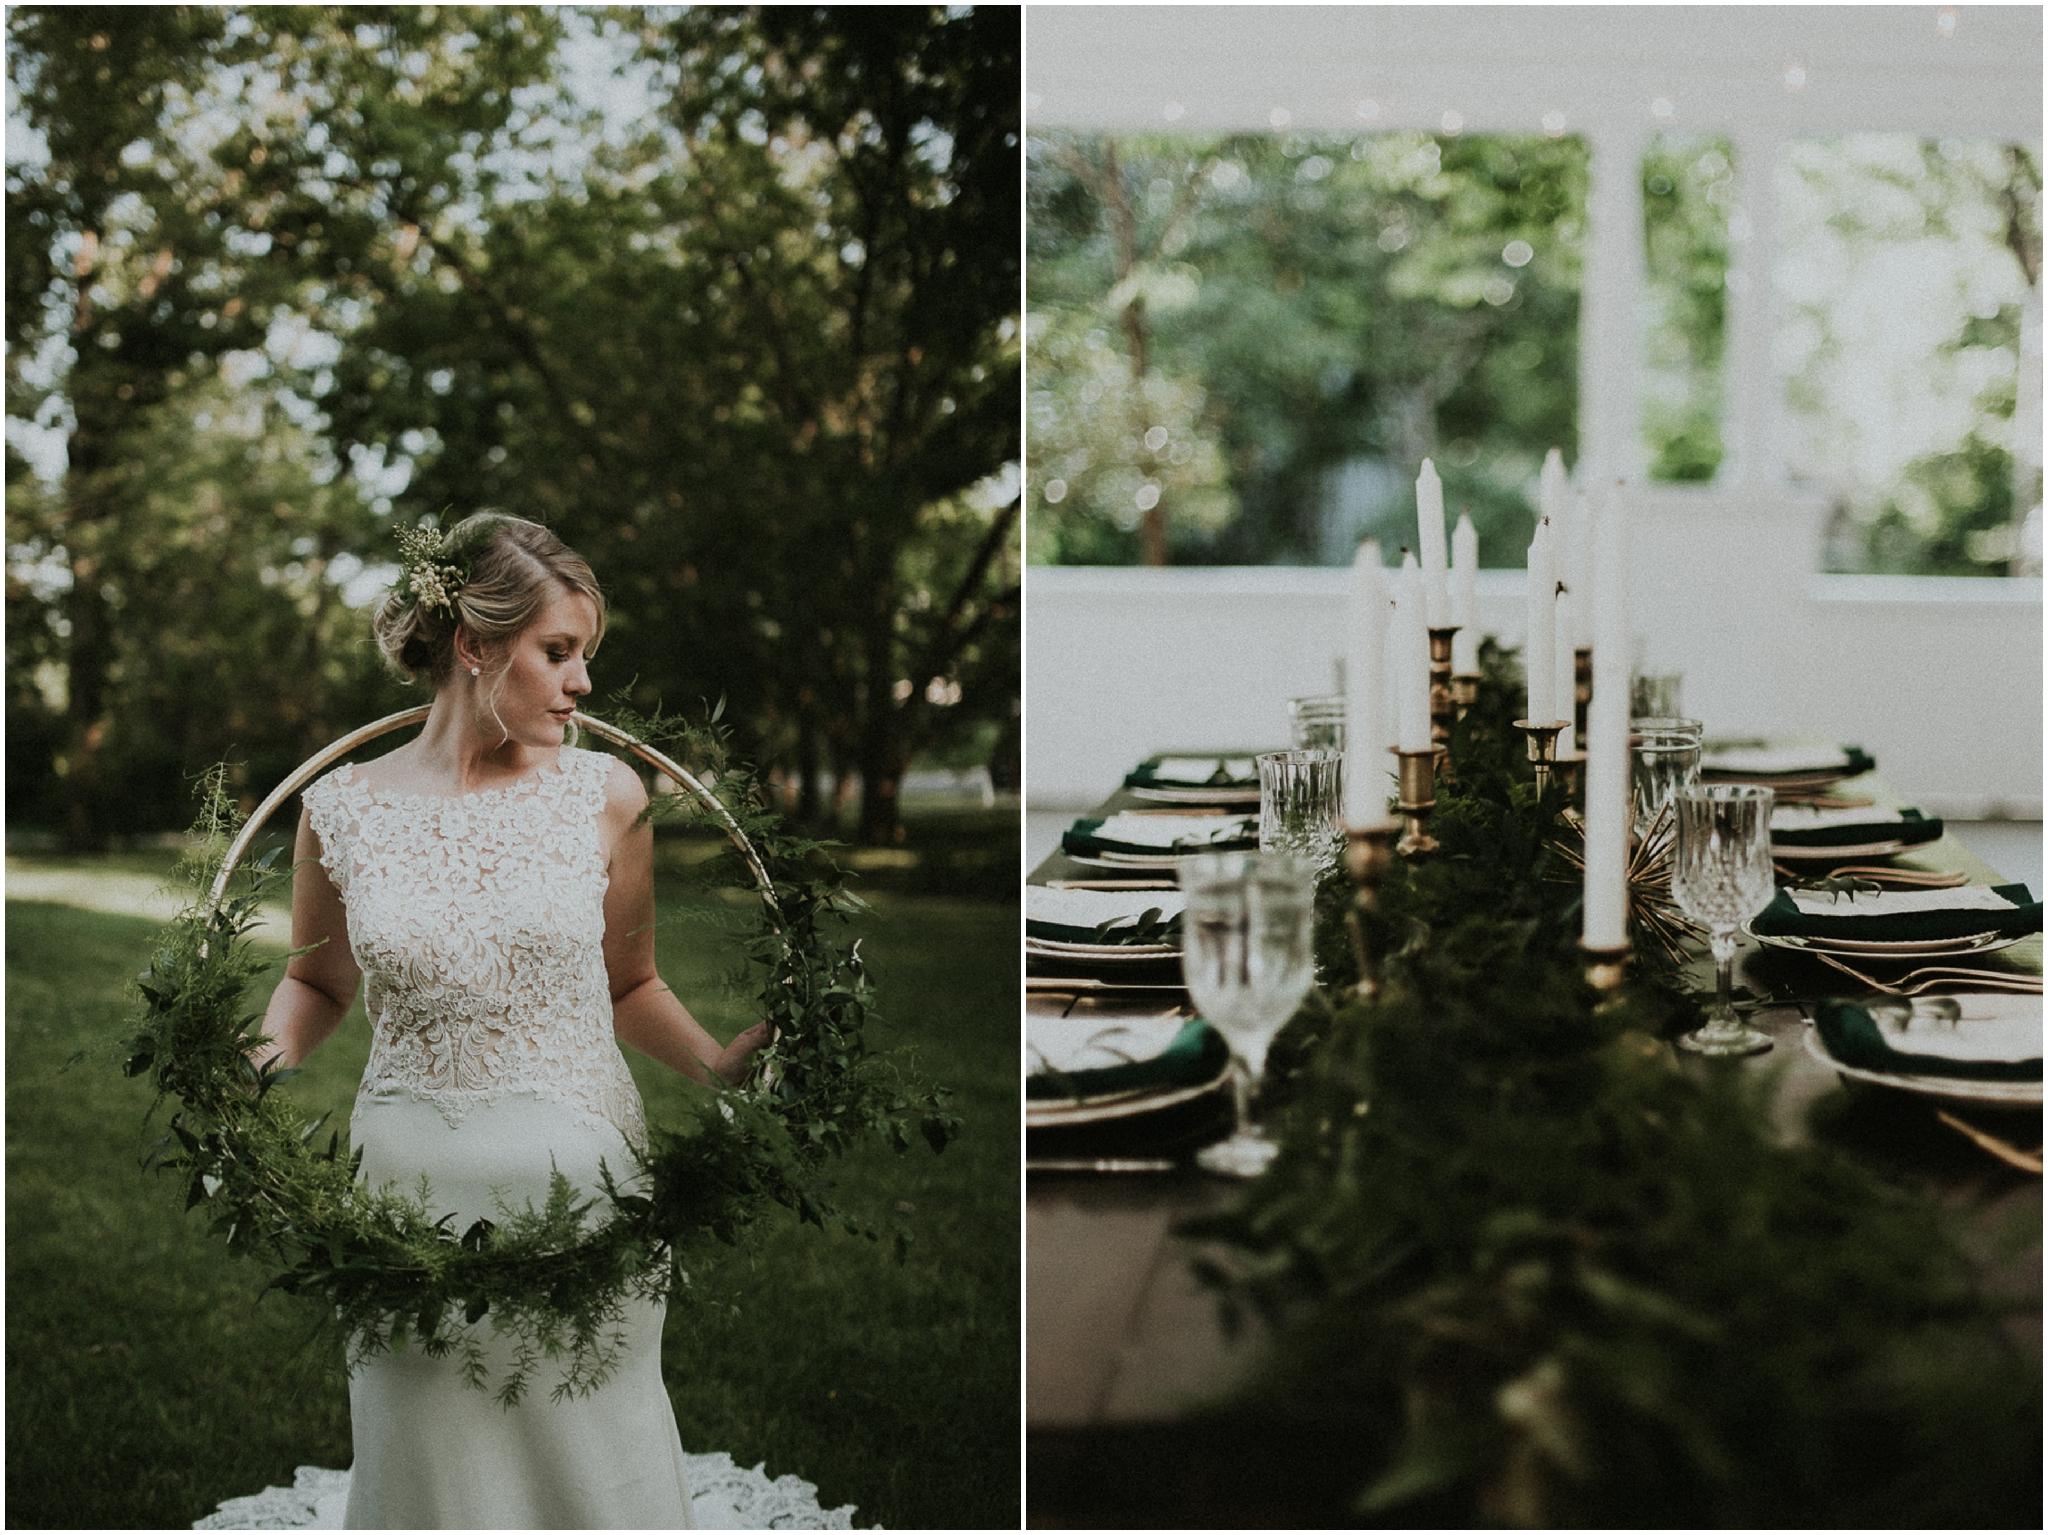 Wedding-photographer-ritchie-hill_0025.jpg